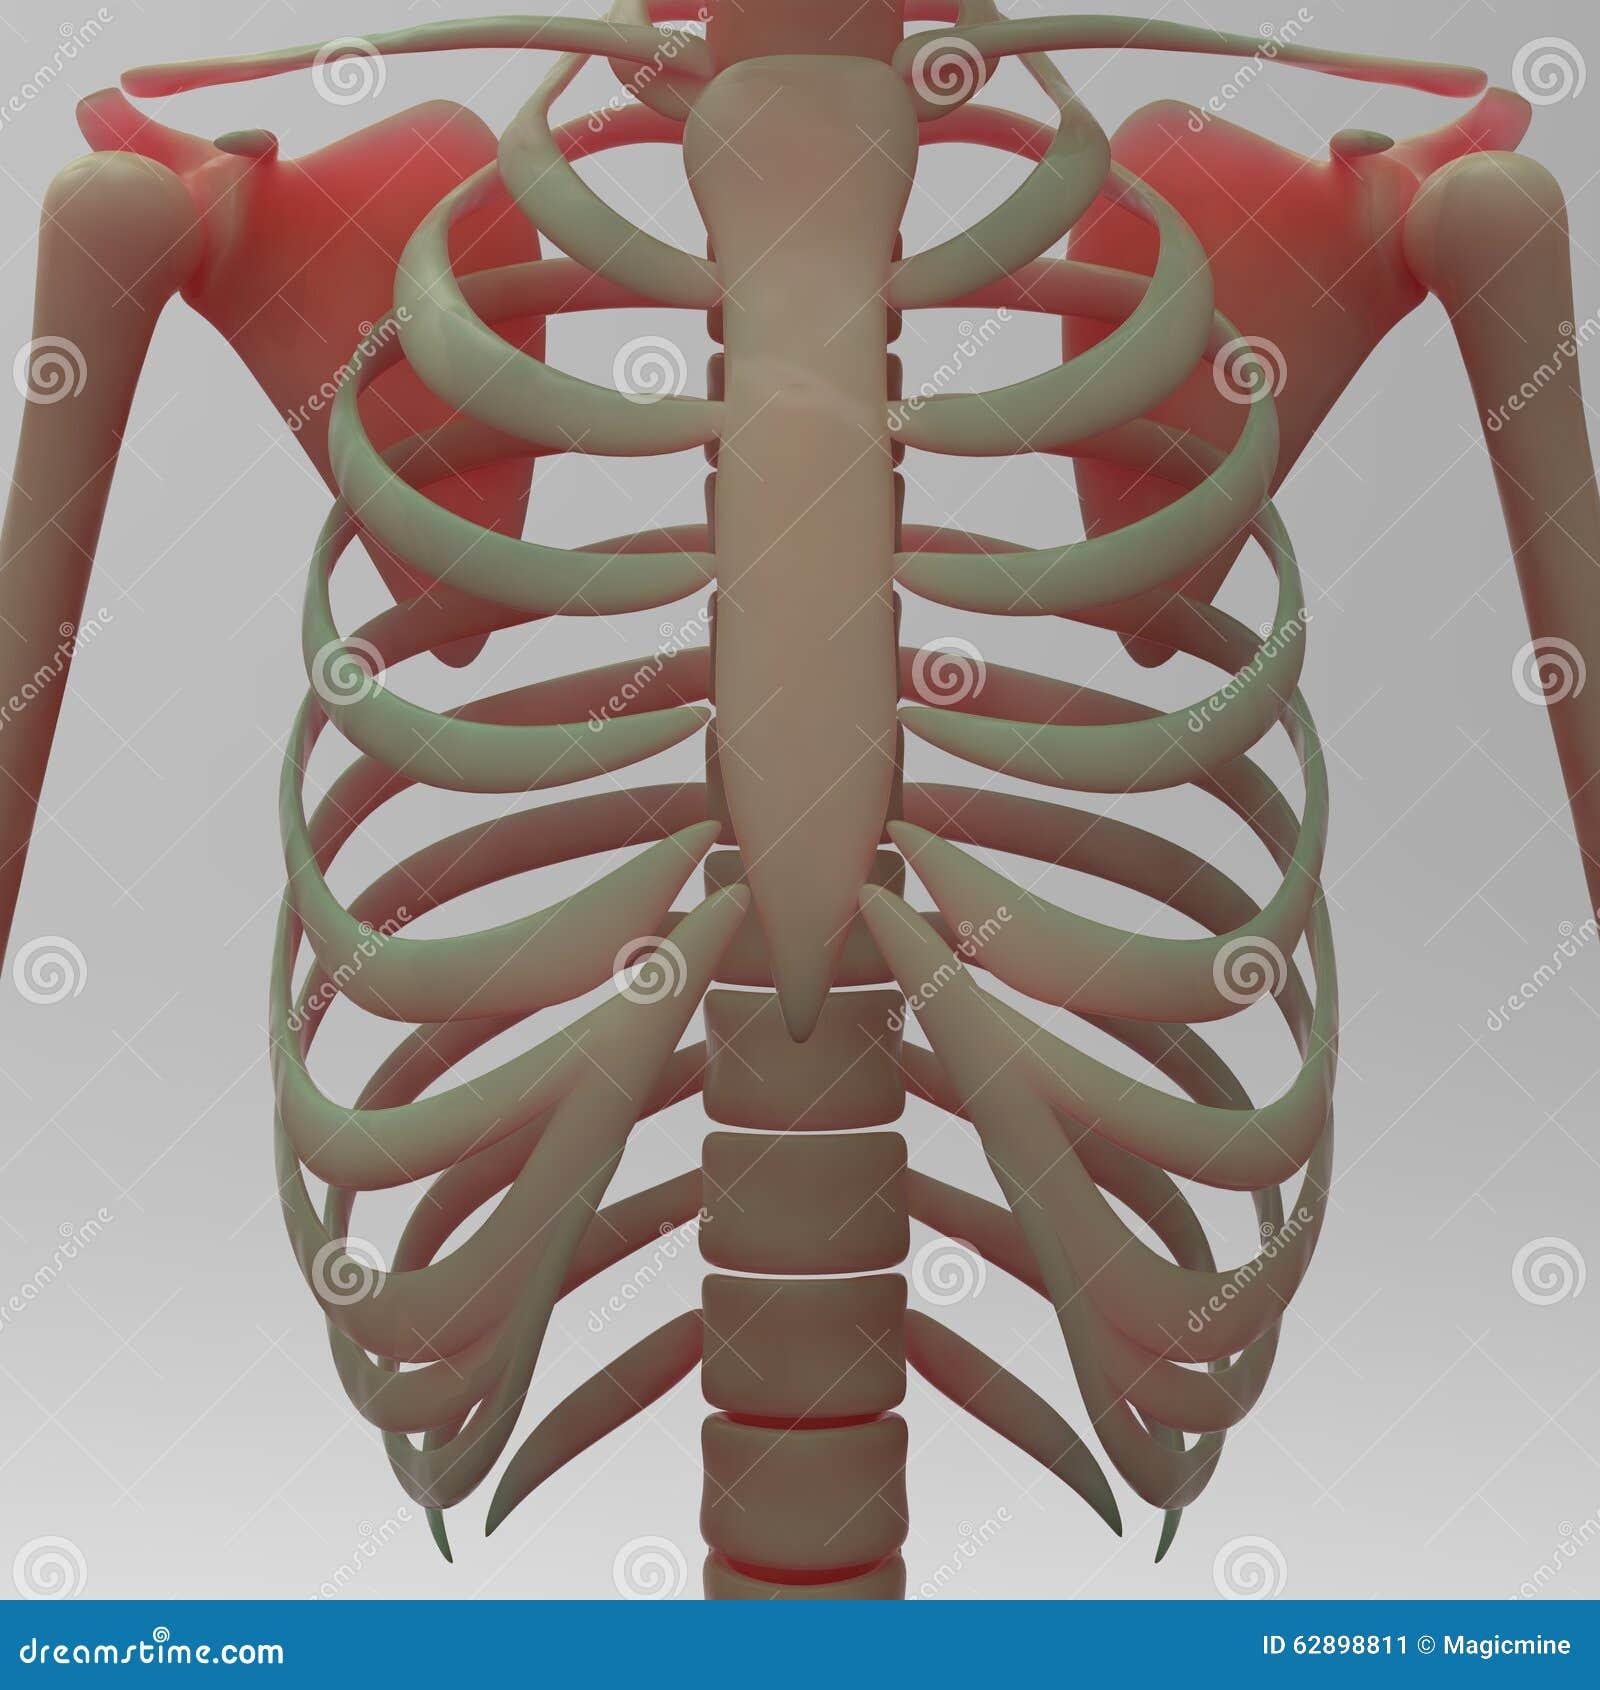 human skeleton ribs stock illustration - image: 62898811, Skeleton